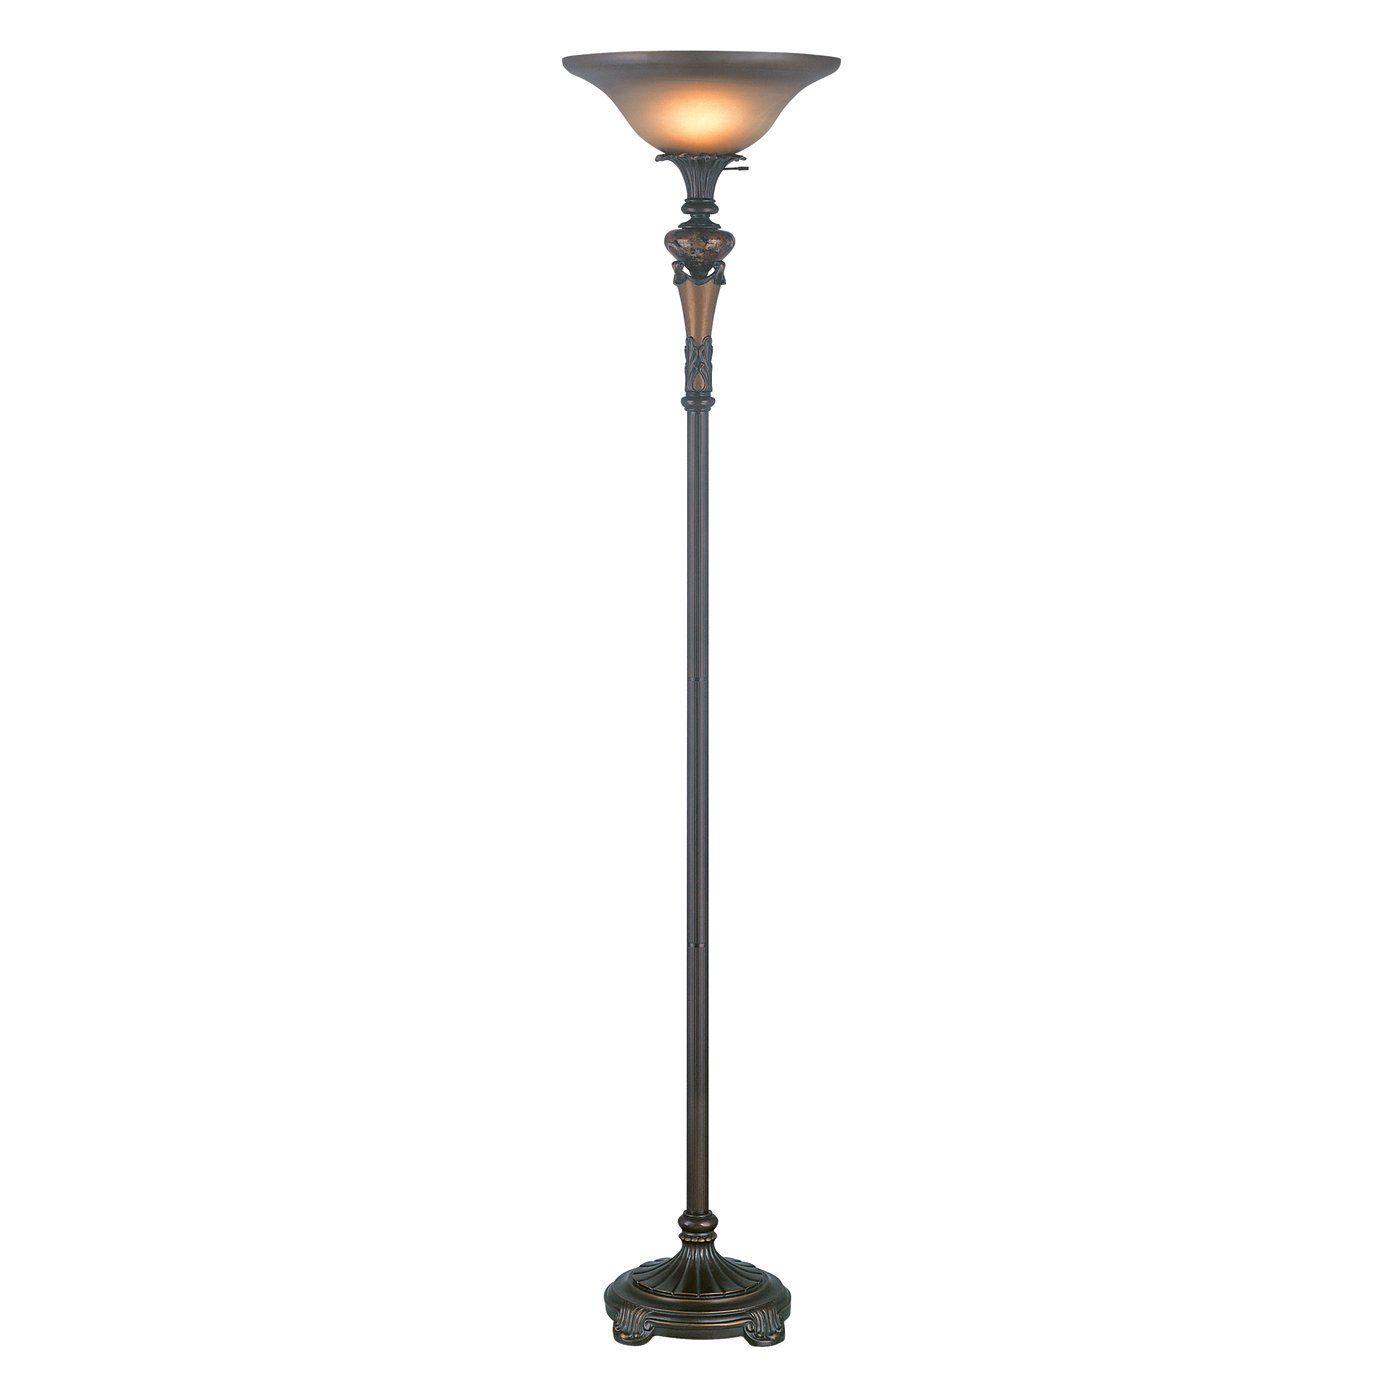 Lite Source CF6309 Muir Torchiere Floor Lamp, Antique Gold ...